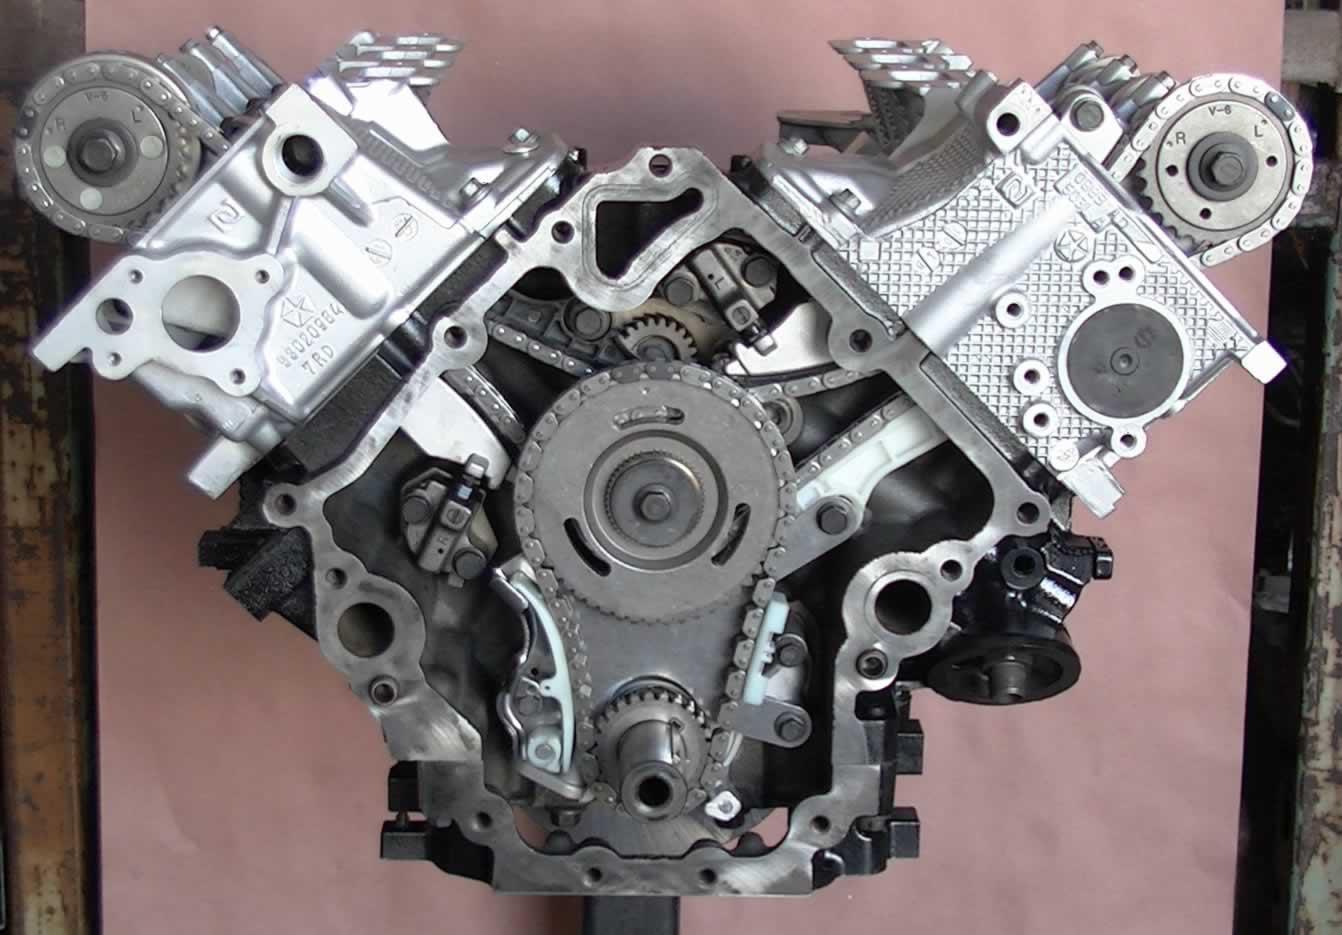 2008 Jeep Grand Cherokee V6 Engine